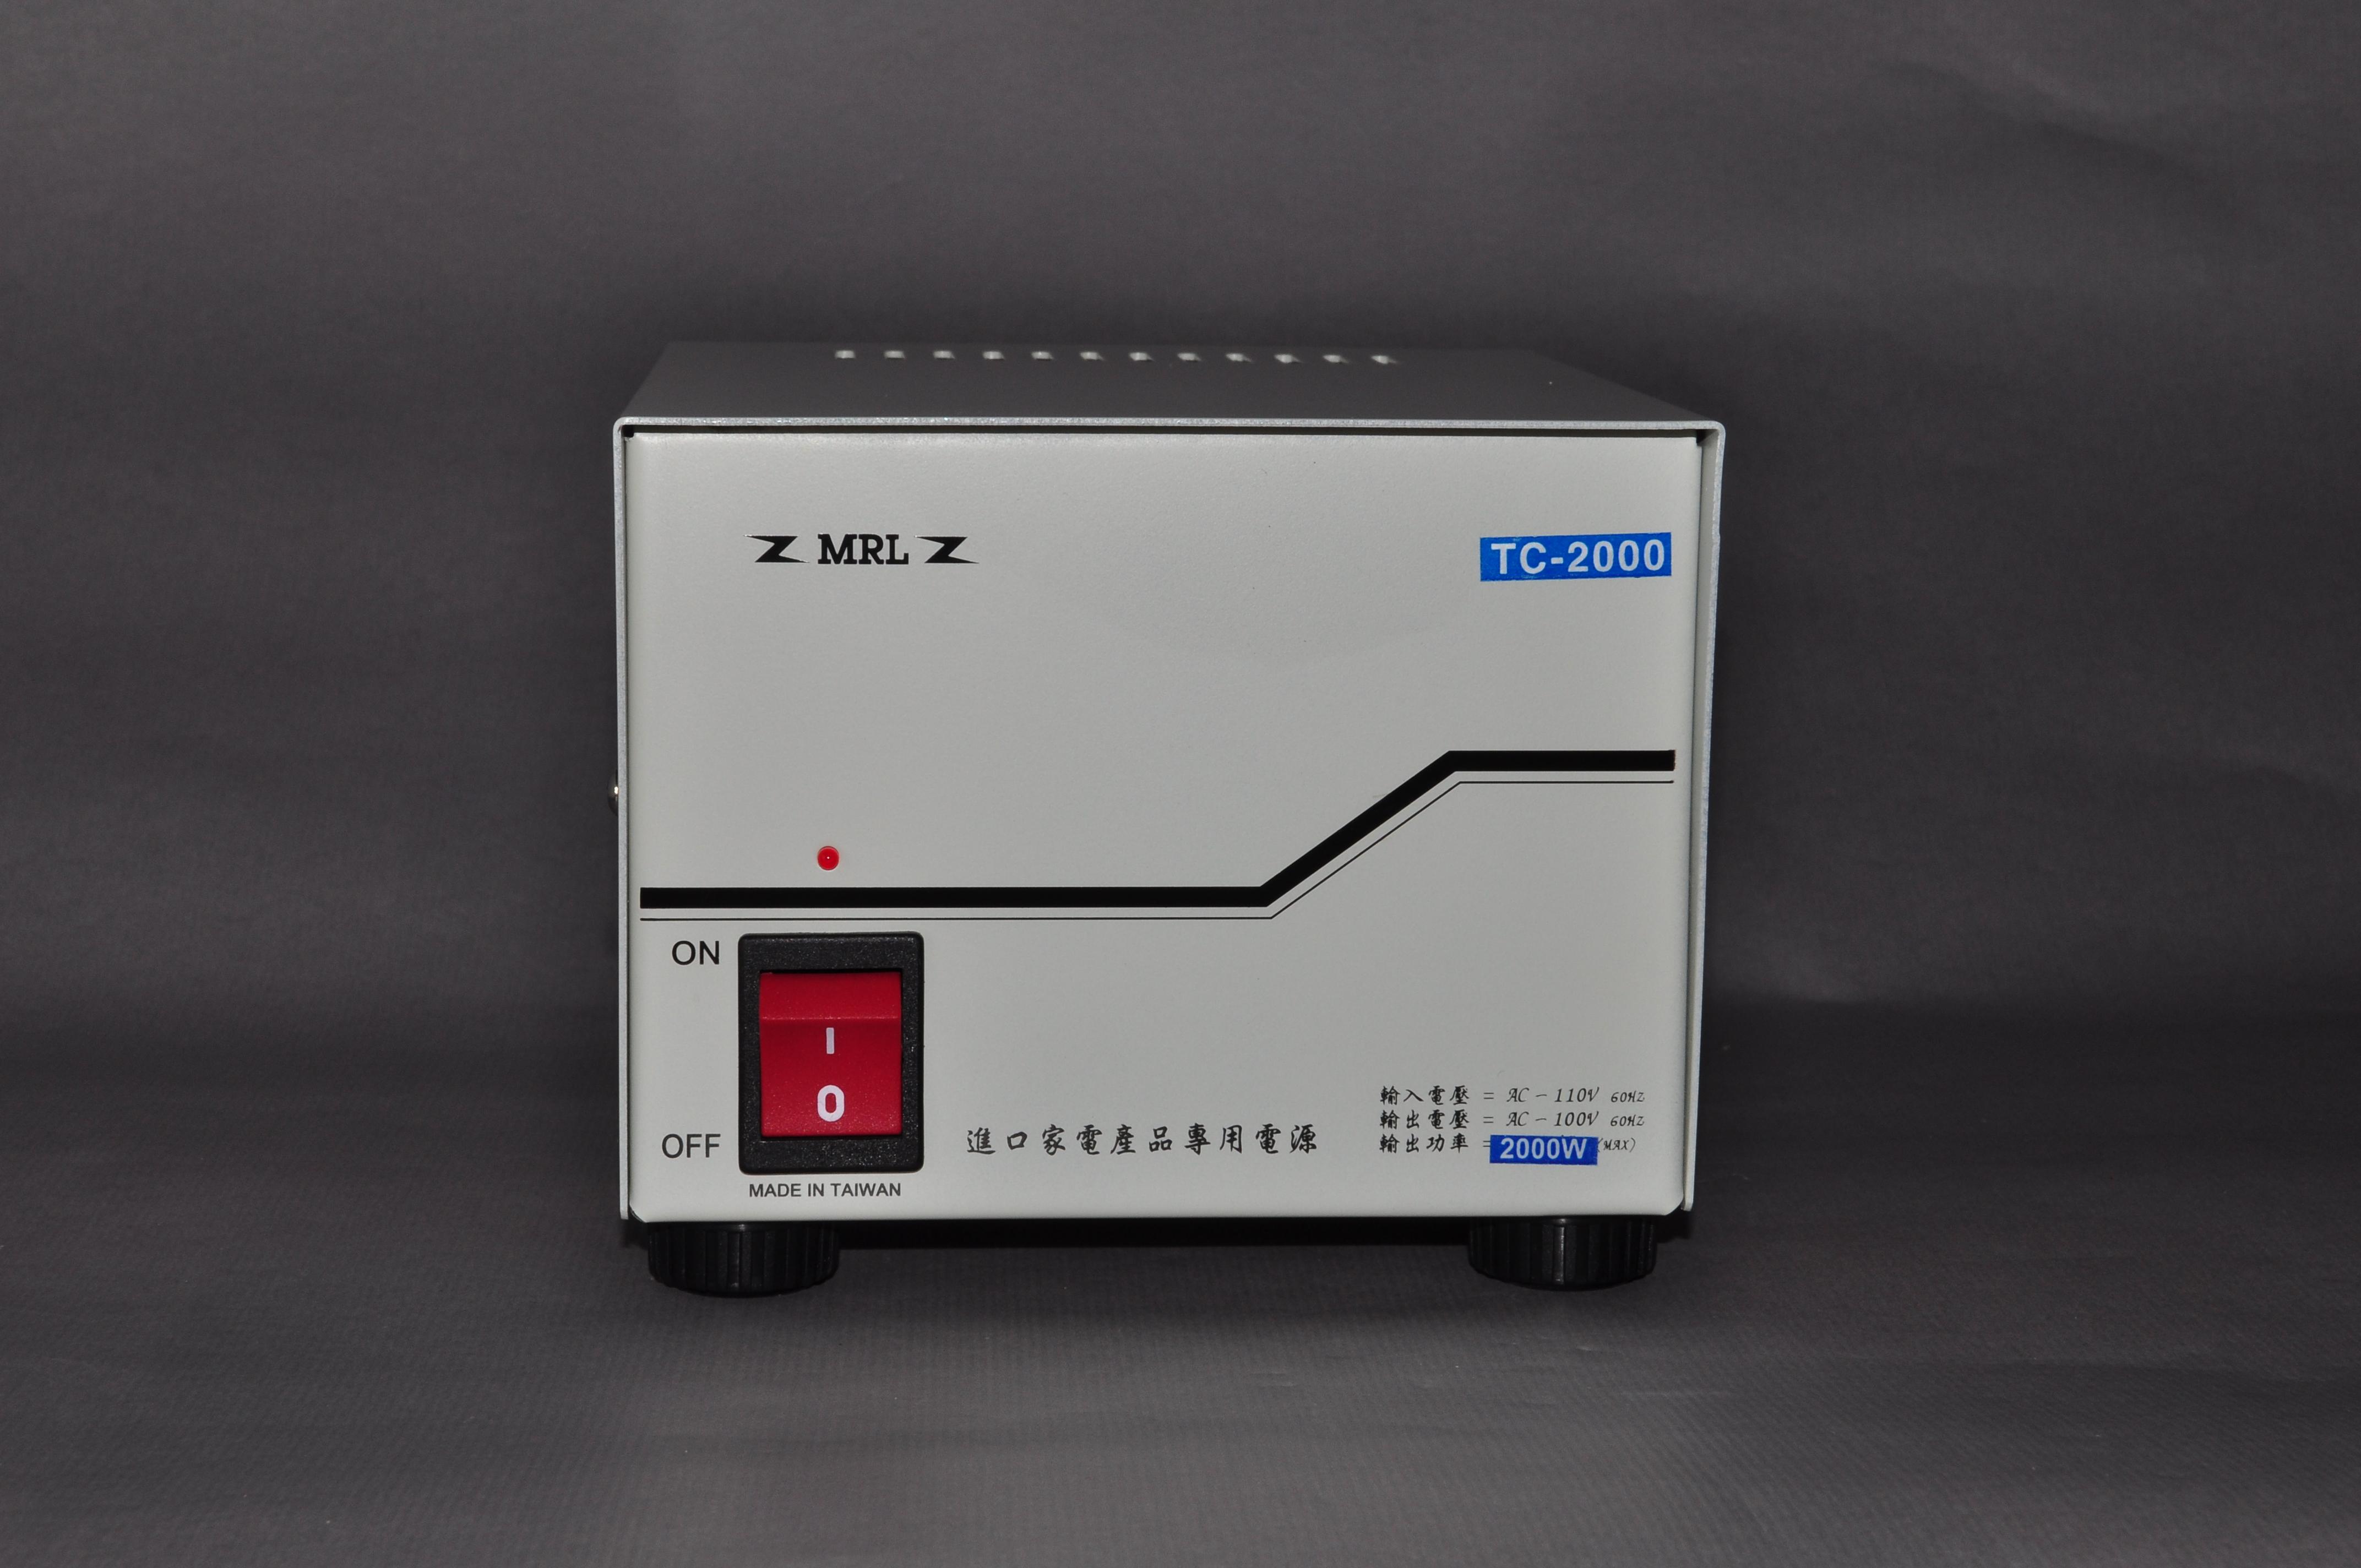 TC-2000